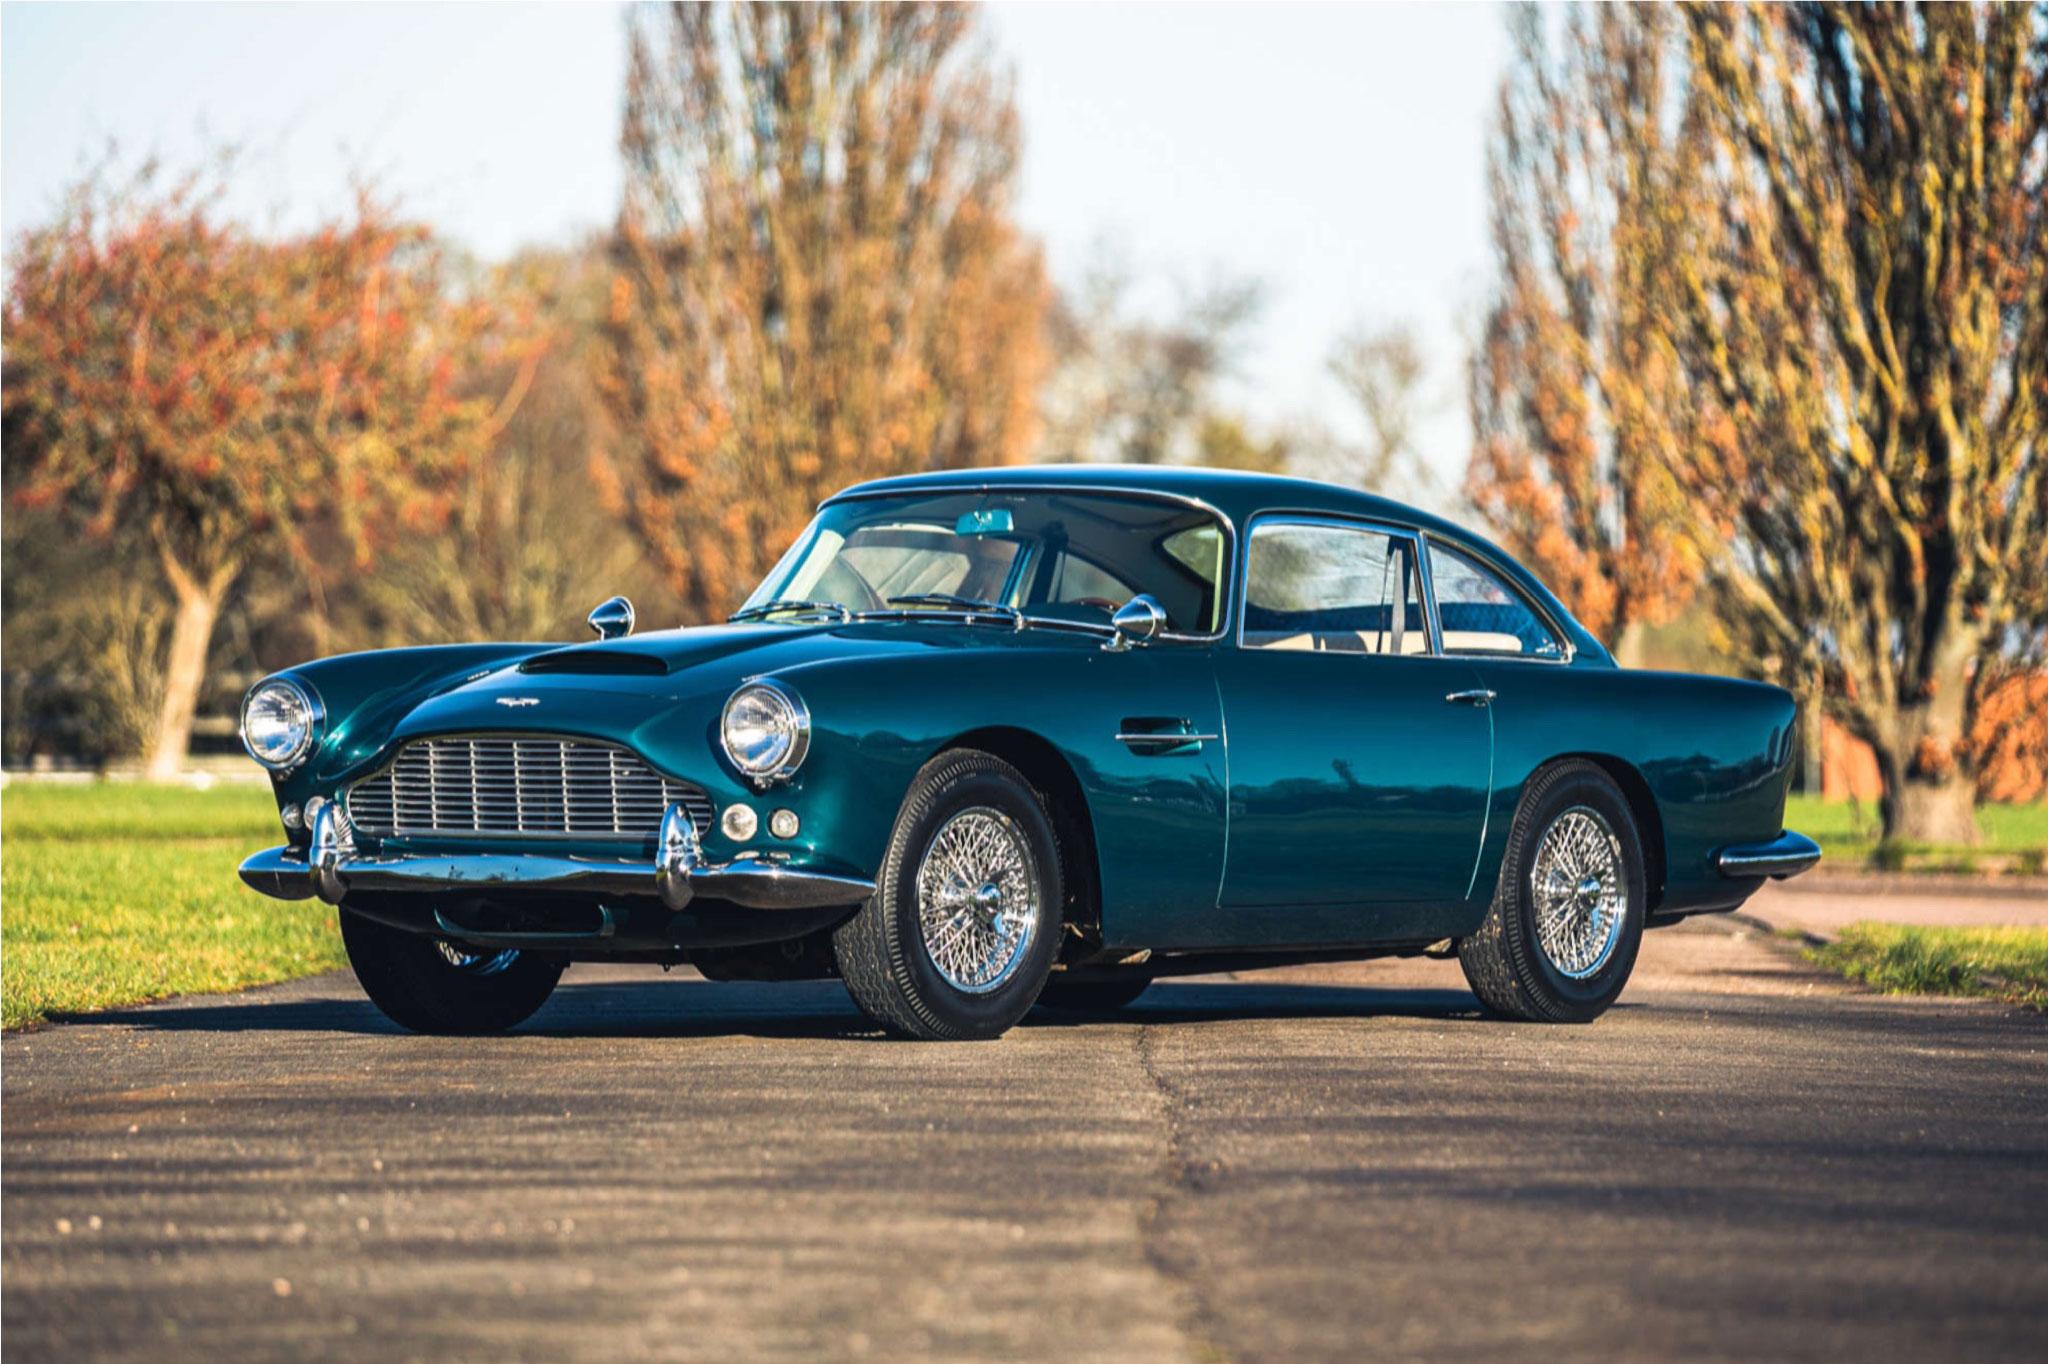 1963 Aston Martin DB4 Series 5 - £354,375 - Silverstone Auction mars 2021.